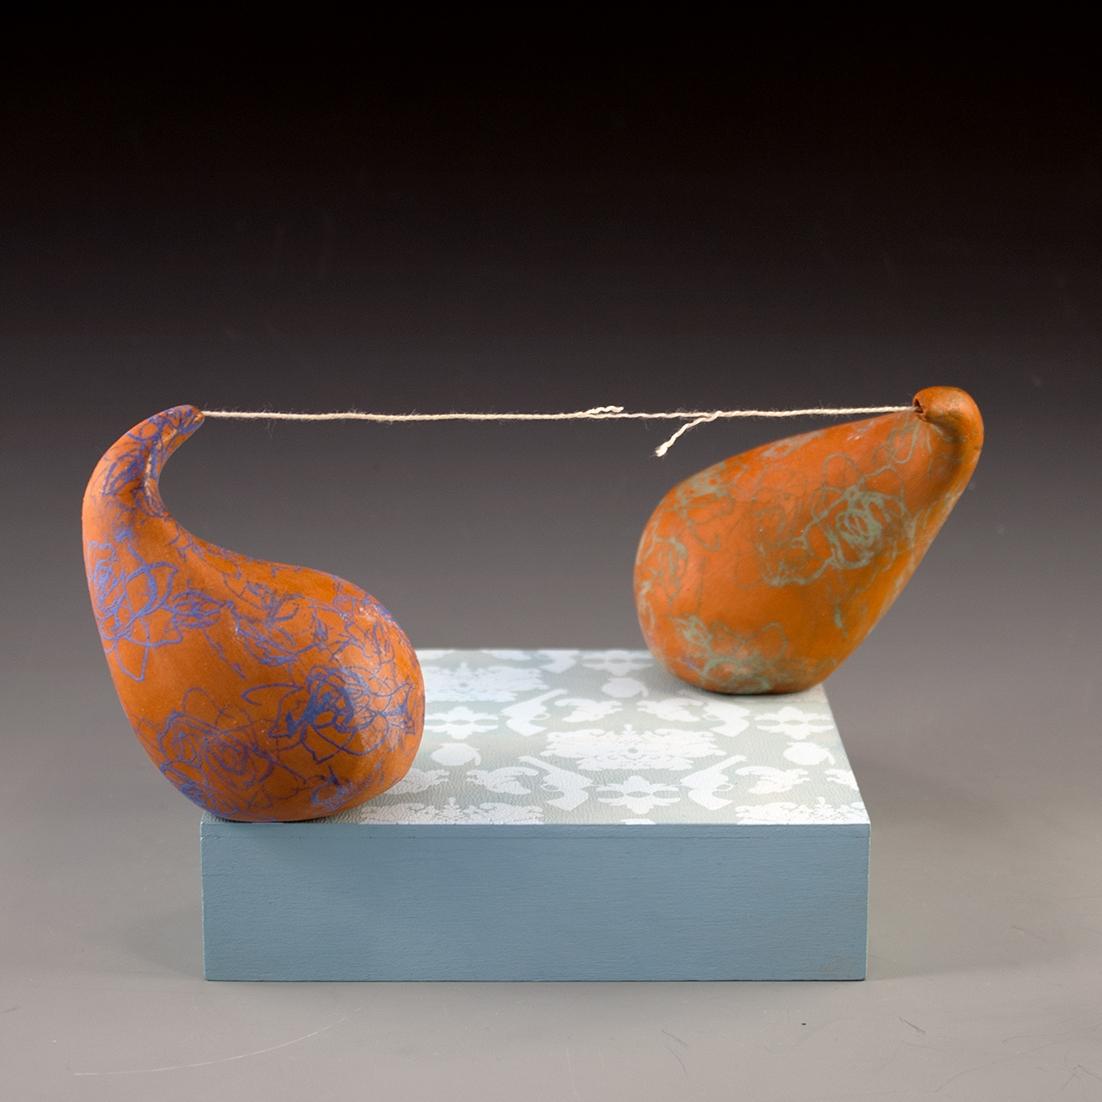 "Deciphering Fiction  Terracotta, Wood, String, Underglaze, Cone 06 oxidation 6"" x 6"" x 6"""